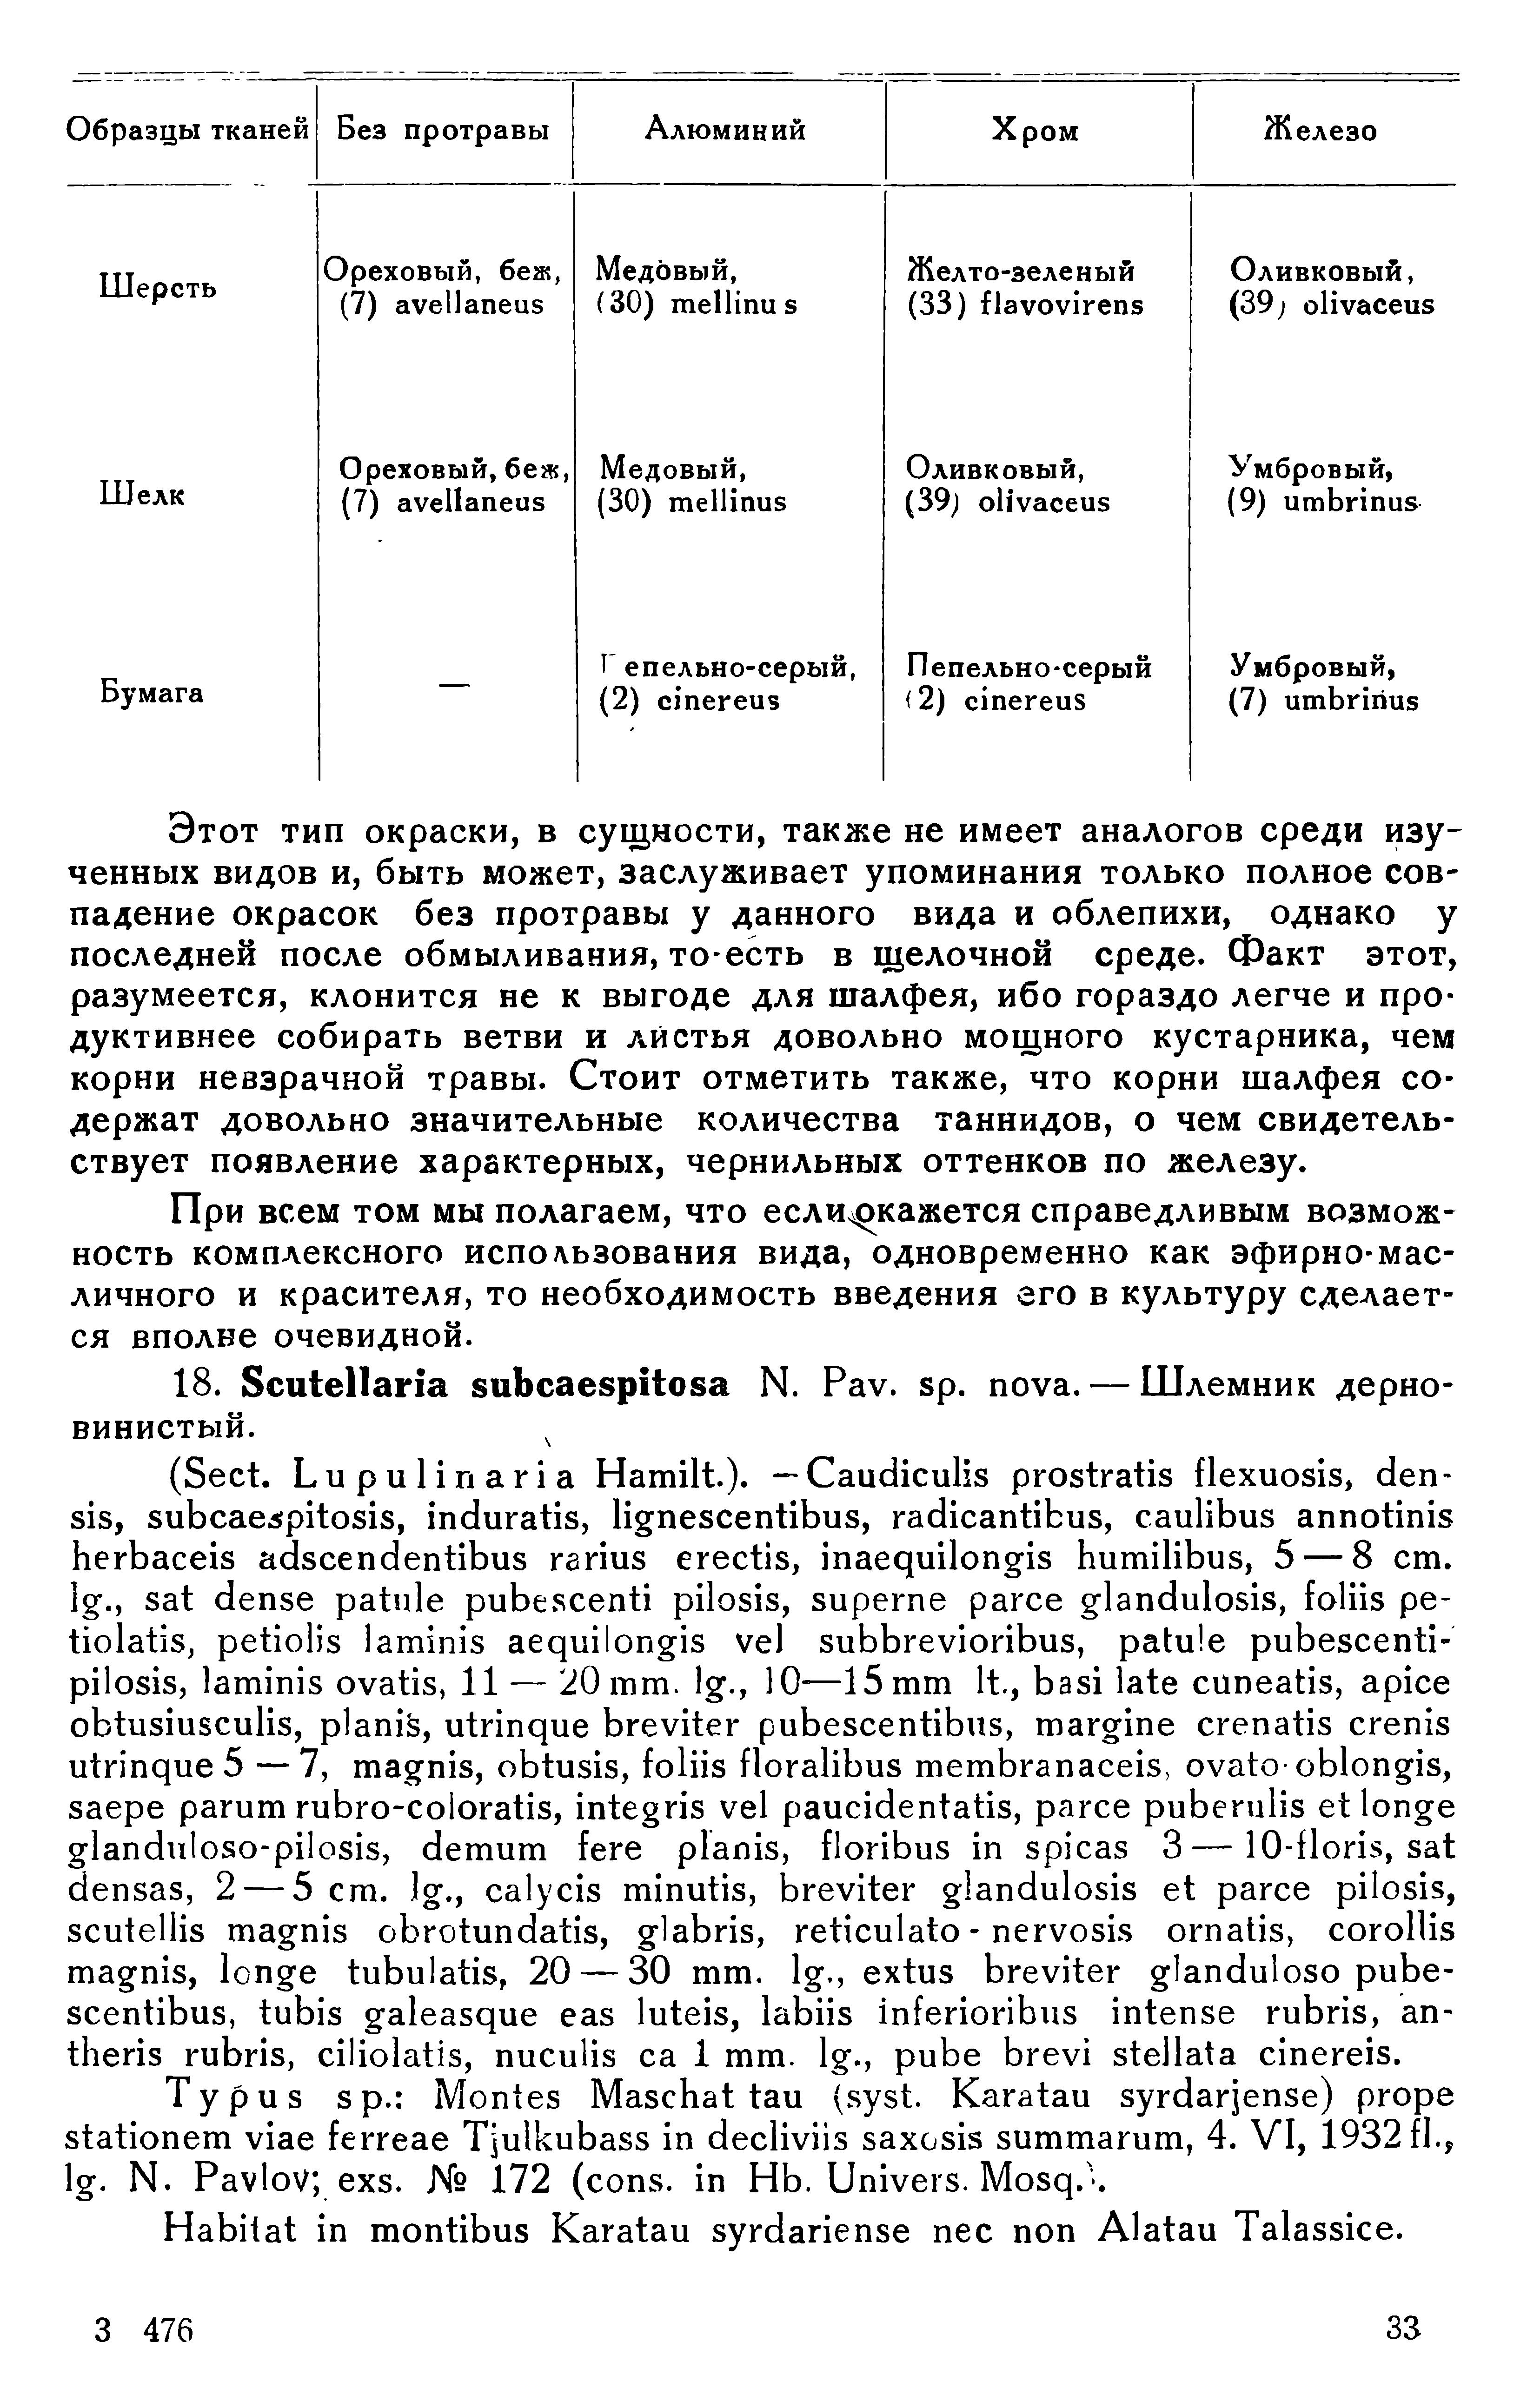 https://forum.plantarium.ru/misc.php?action=pun_attachment&item=26602&download=0